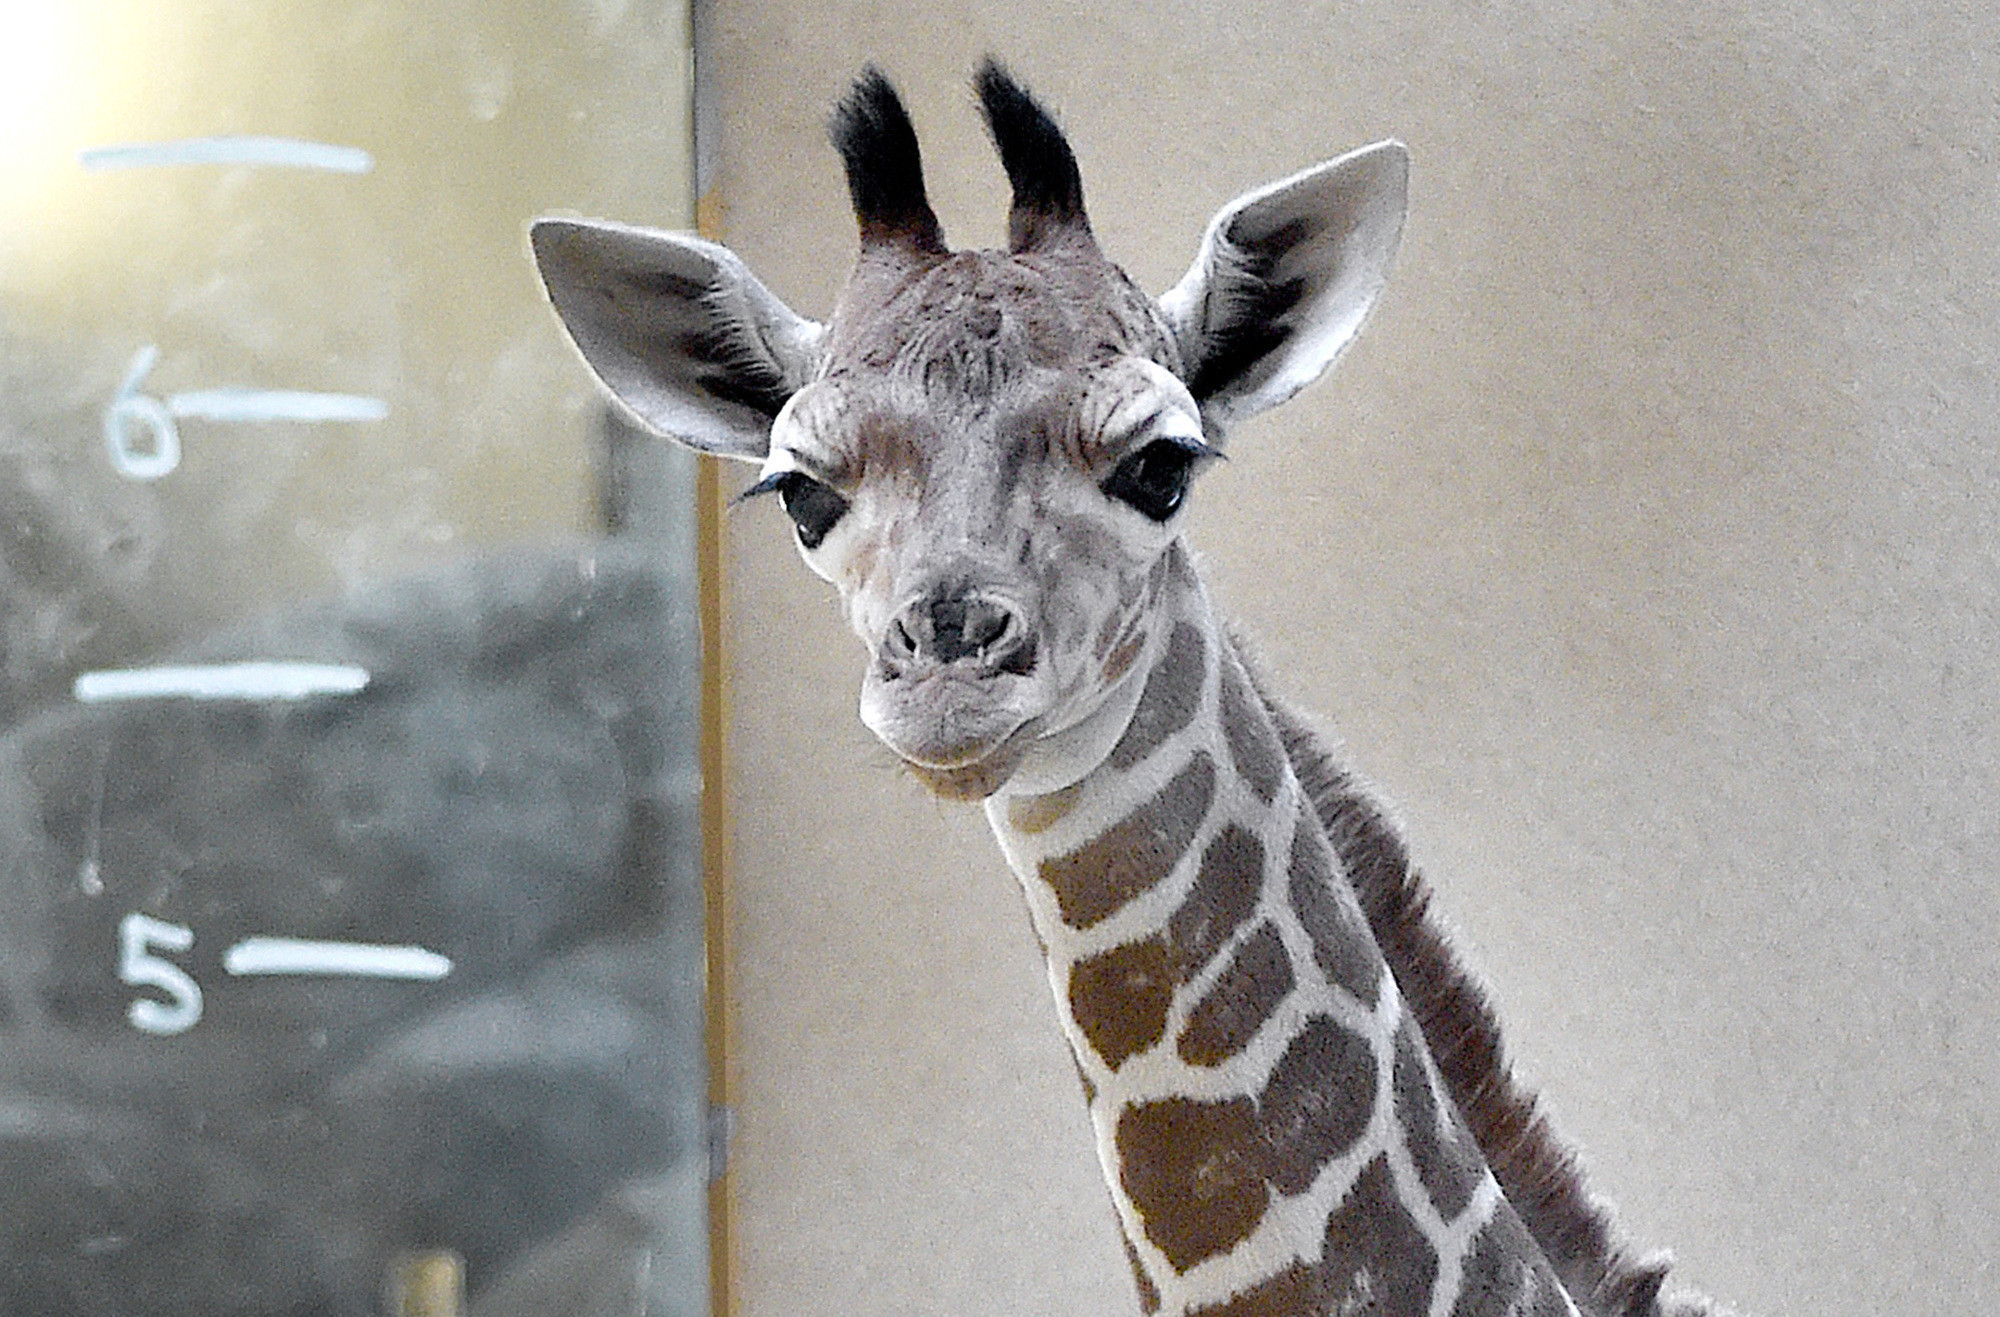 maryland zoo hosts online voting on name of newborn giraffe